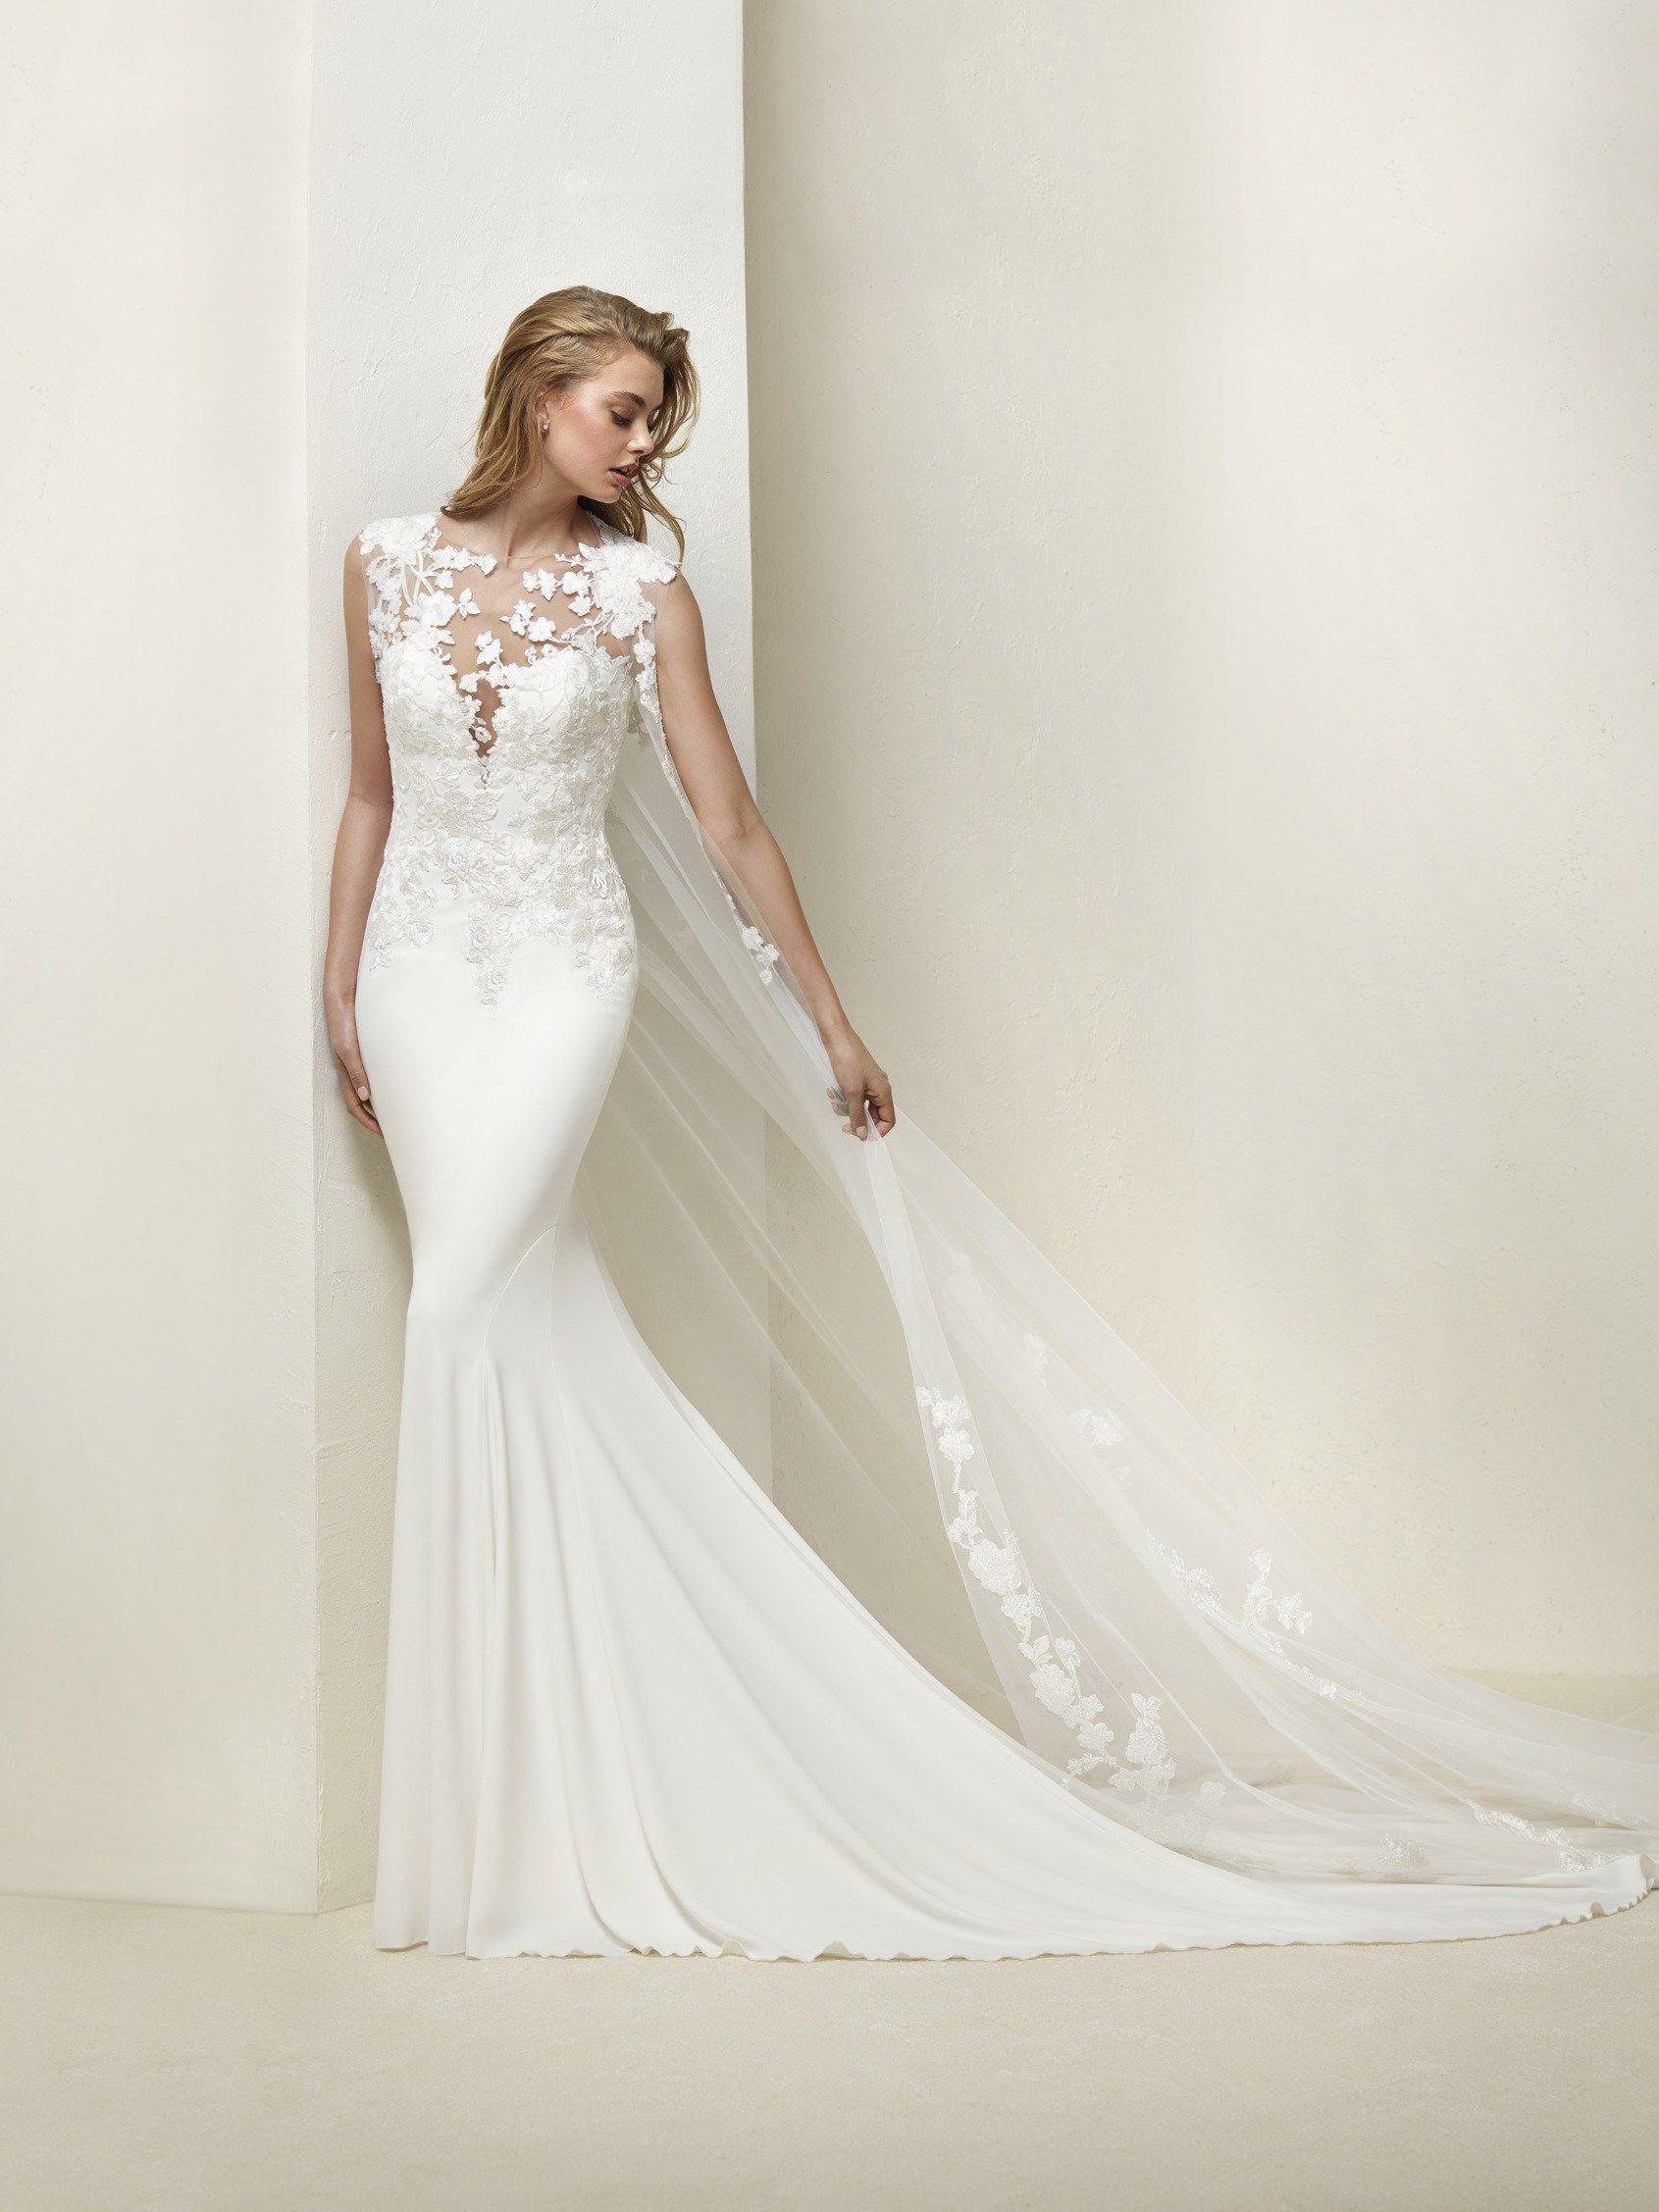 49++ Off the rack wedding dresses phoenix ideas in 2021